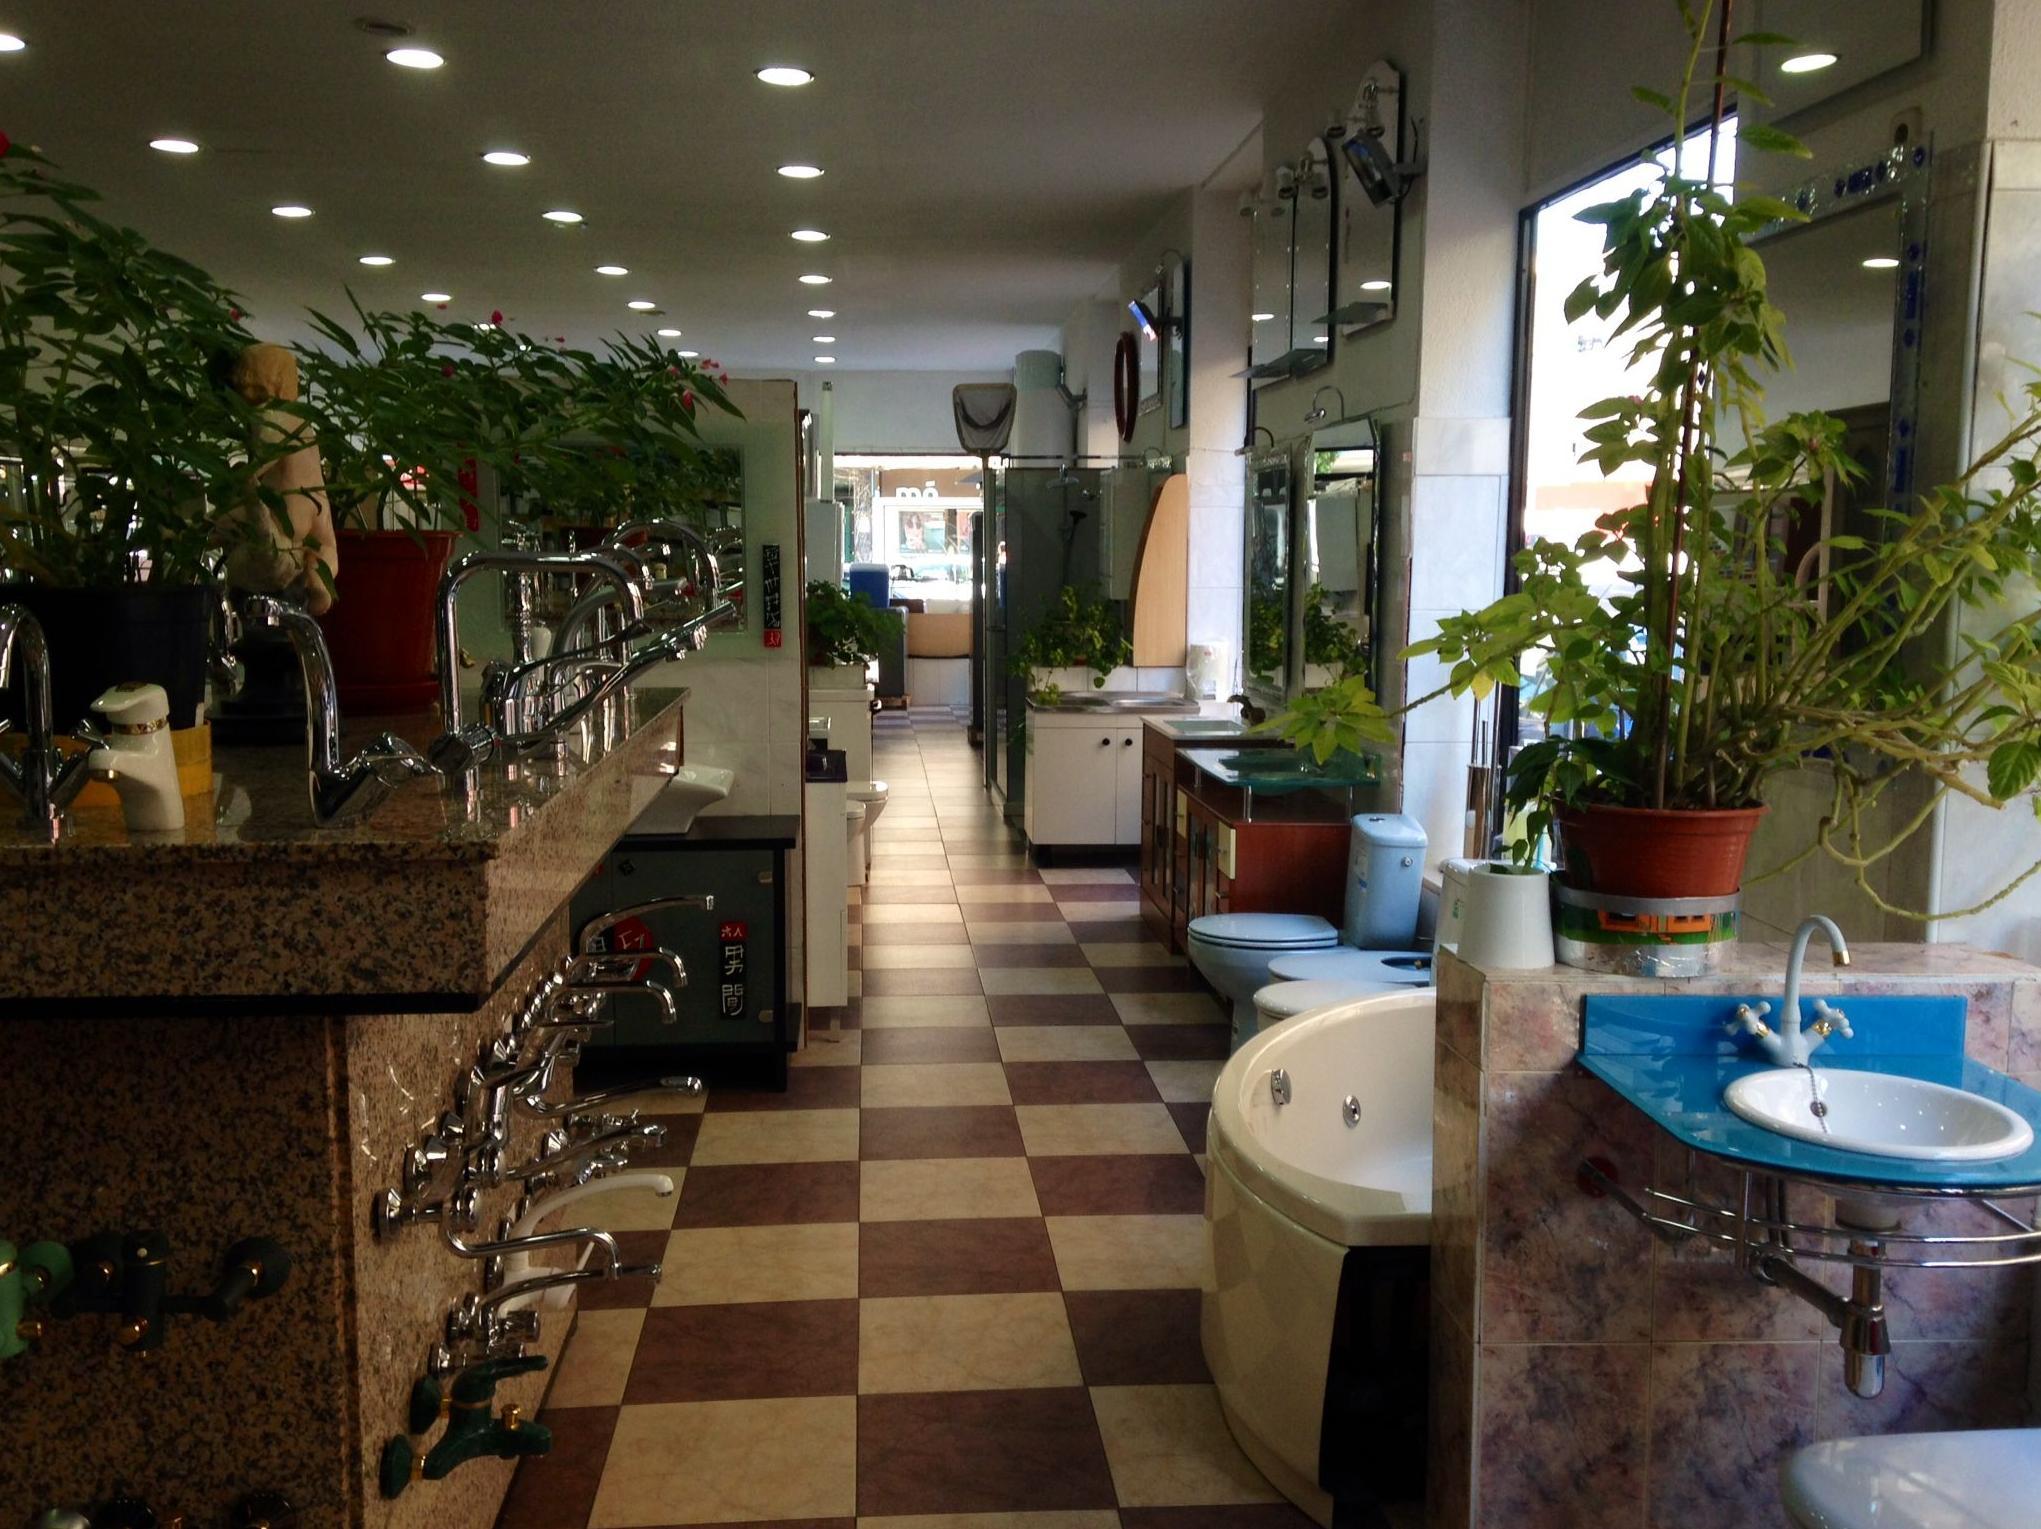 Interior de la la tienda